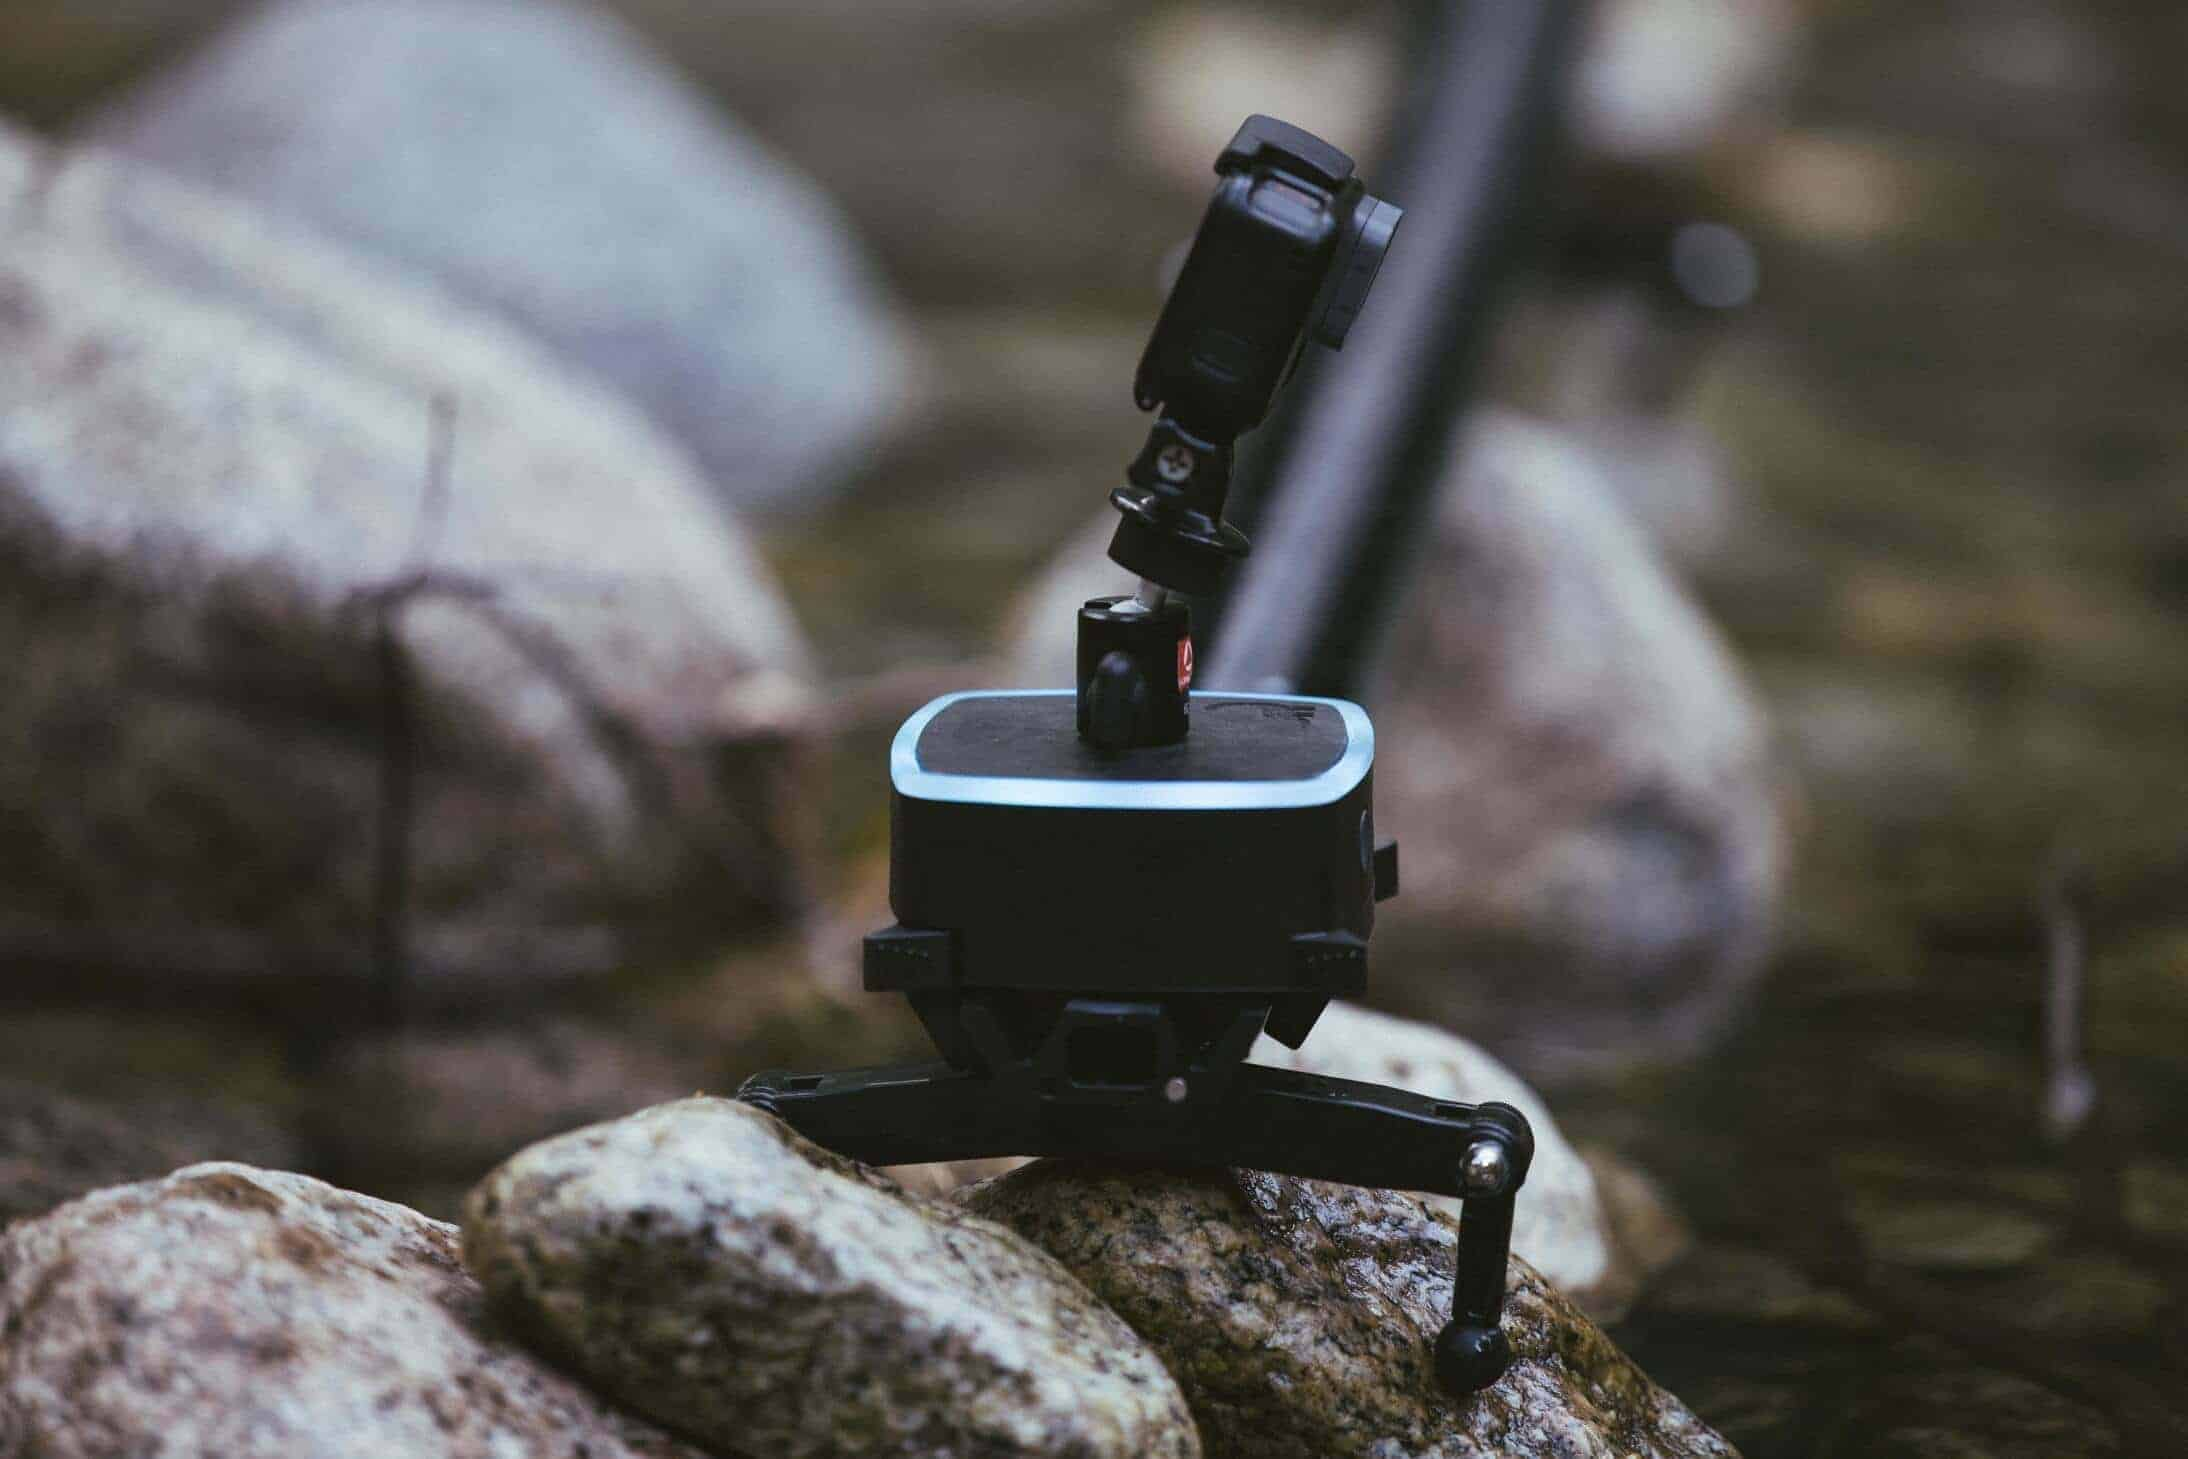 Trek Modular Camera Slider System From Dyno Electronics Press Material 04